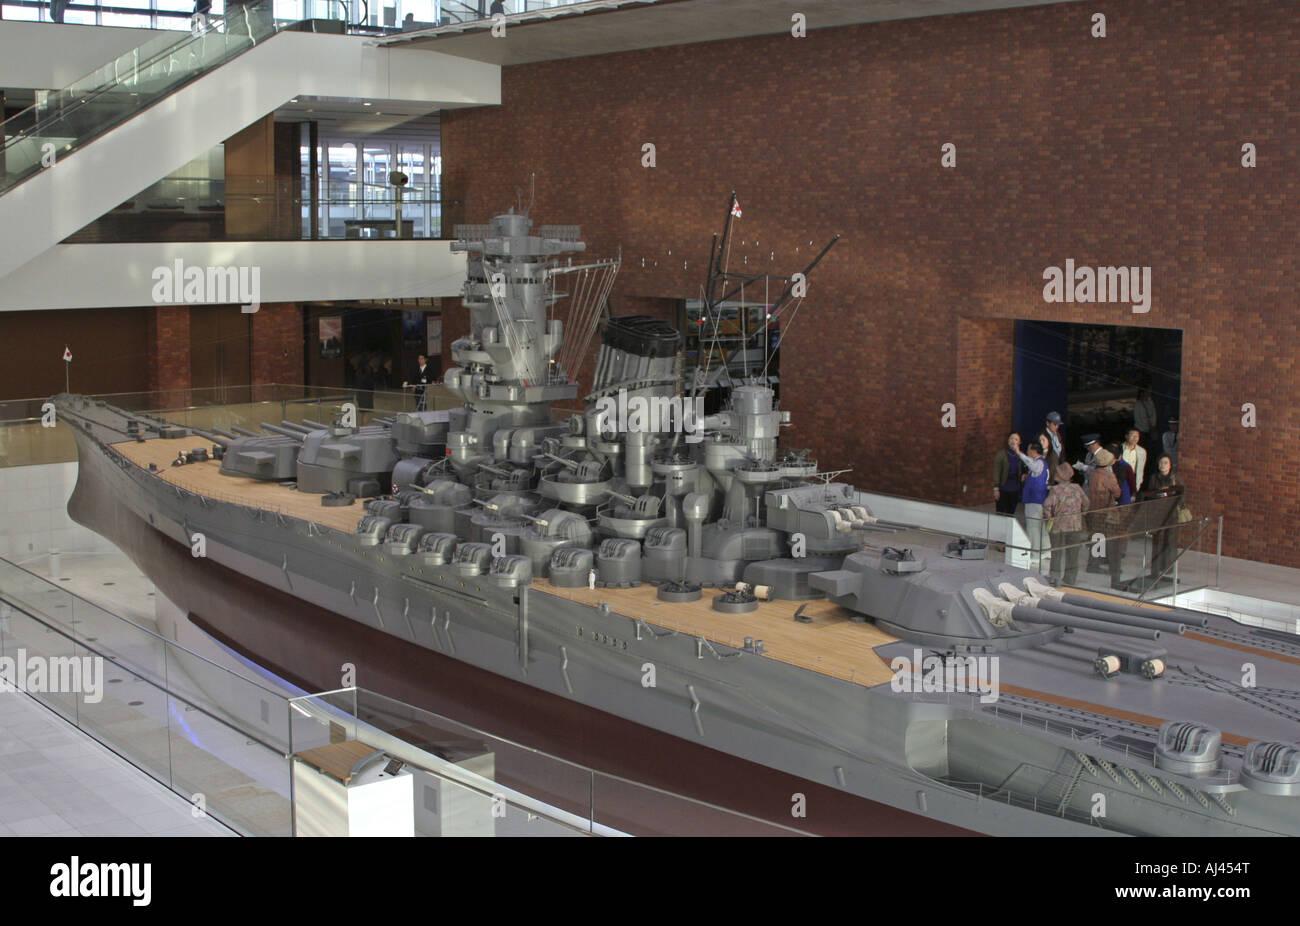 1:10 Scale Model of Battle ship Yamato displayed at Yamato